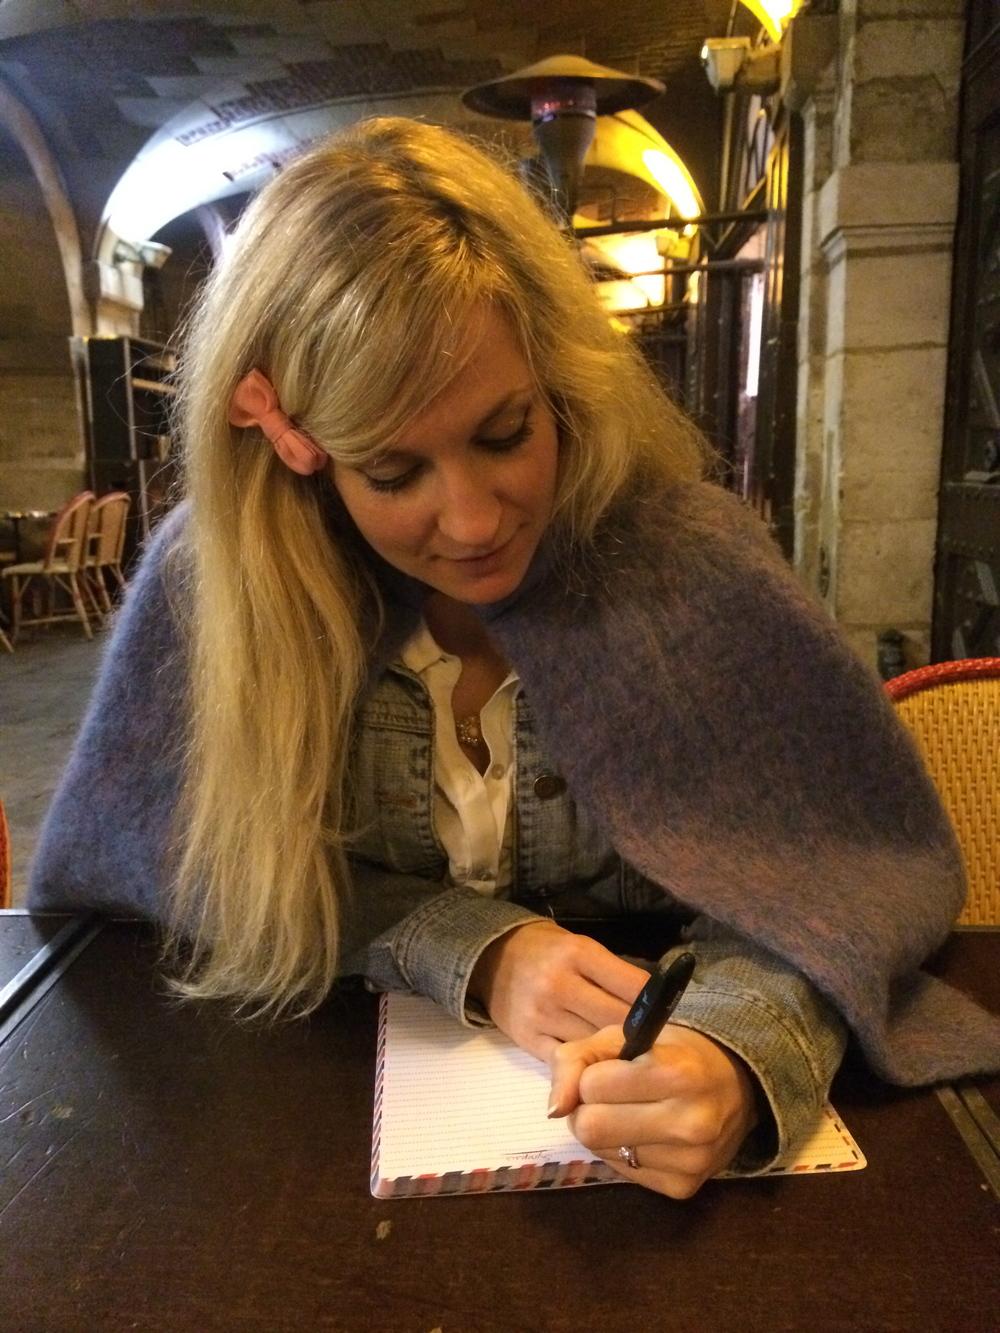 Late night writing at Hugo's restaurant